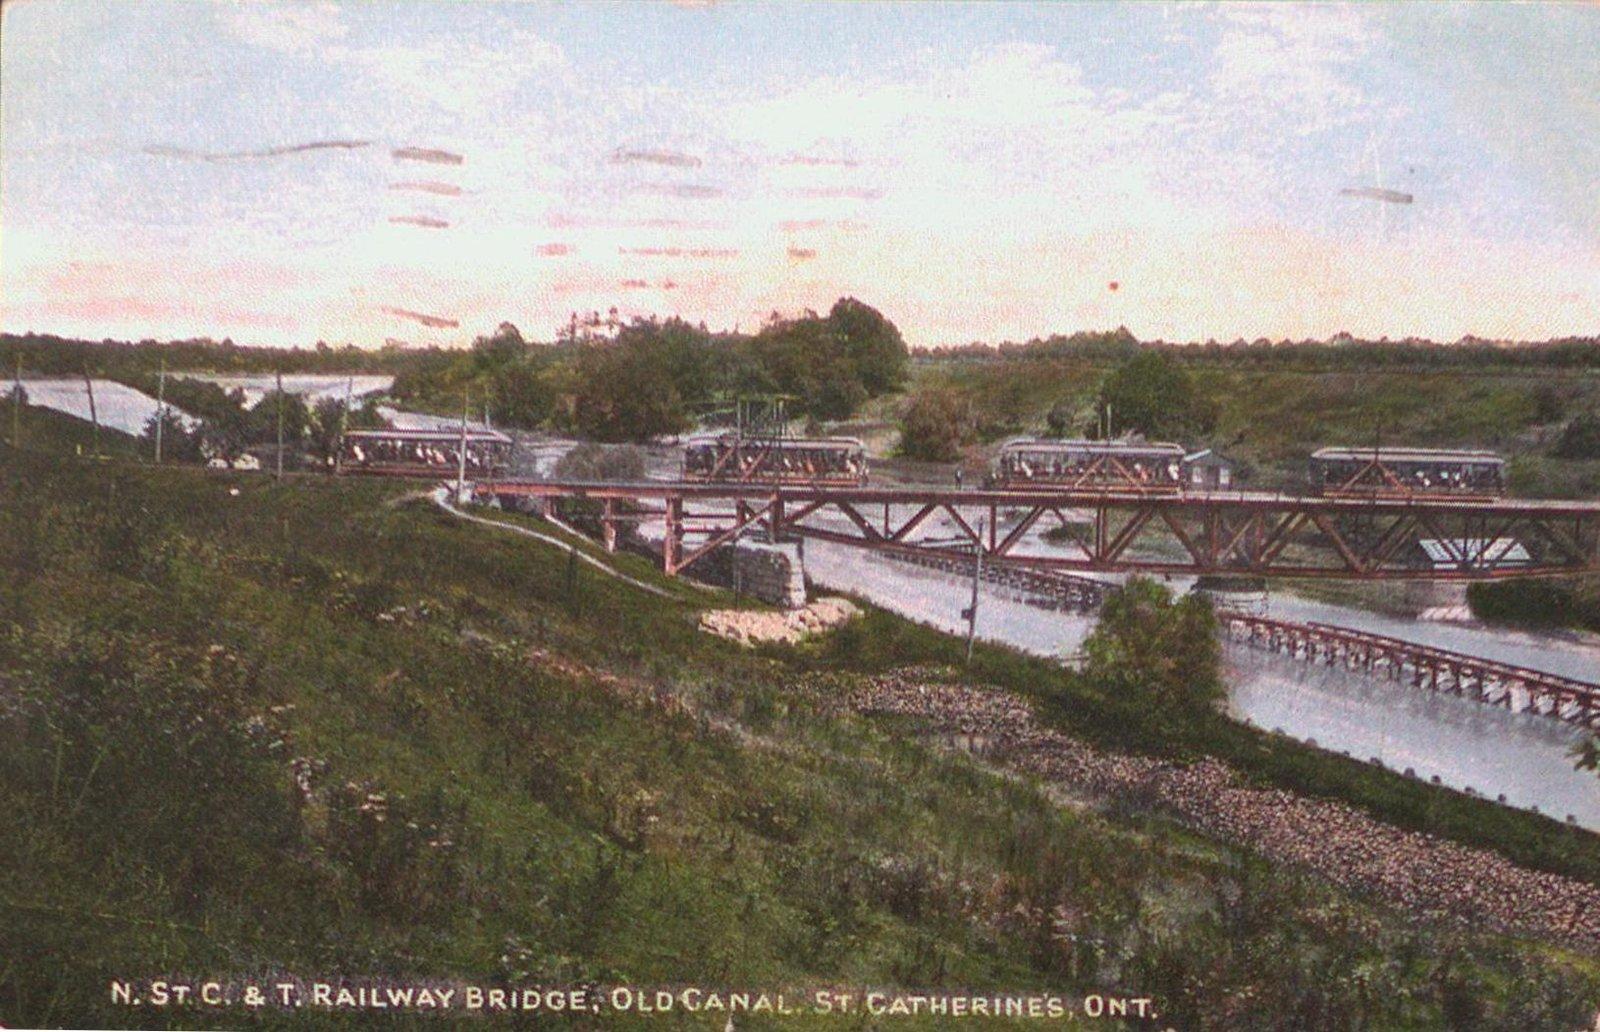 Niagara, St. Catharines, & Toronto Railway Bridge over the Old Canal